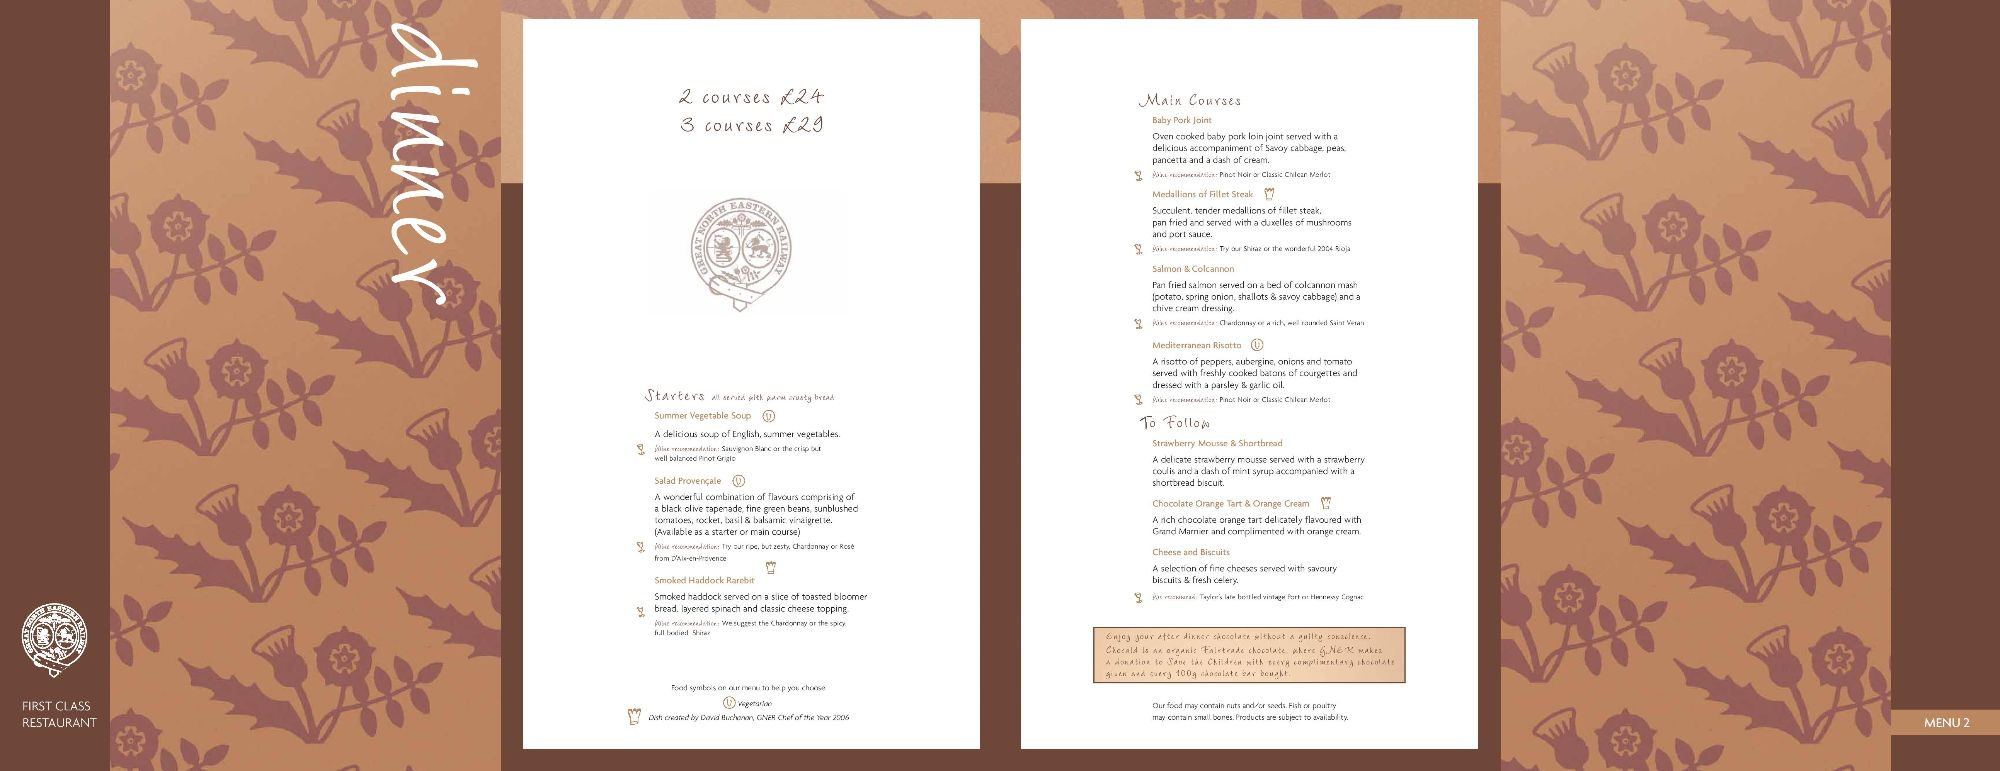 Image showing sample of the GNER dinner menu circa 2007.